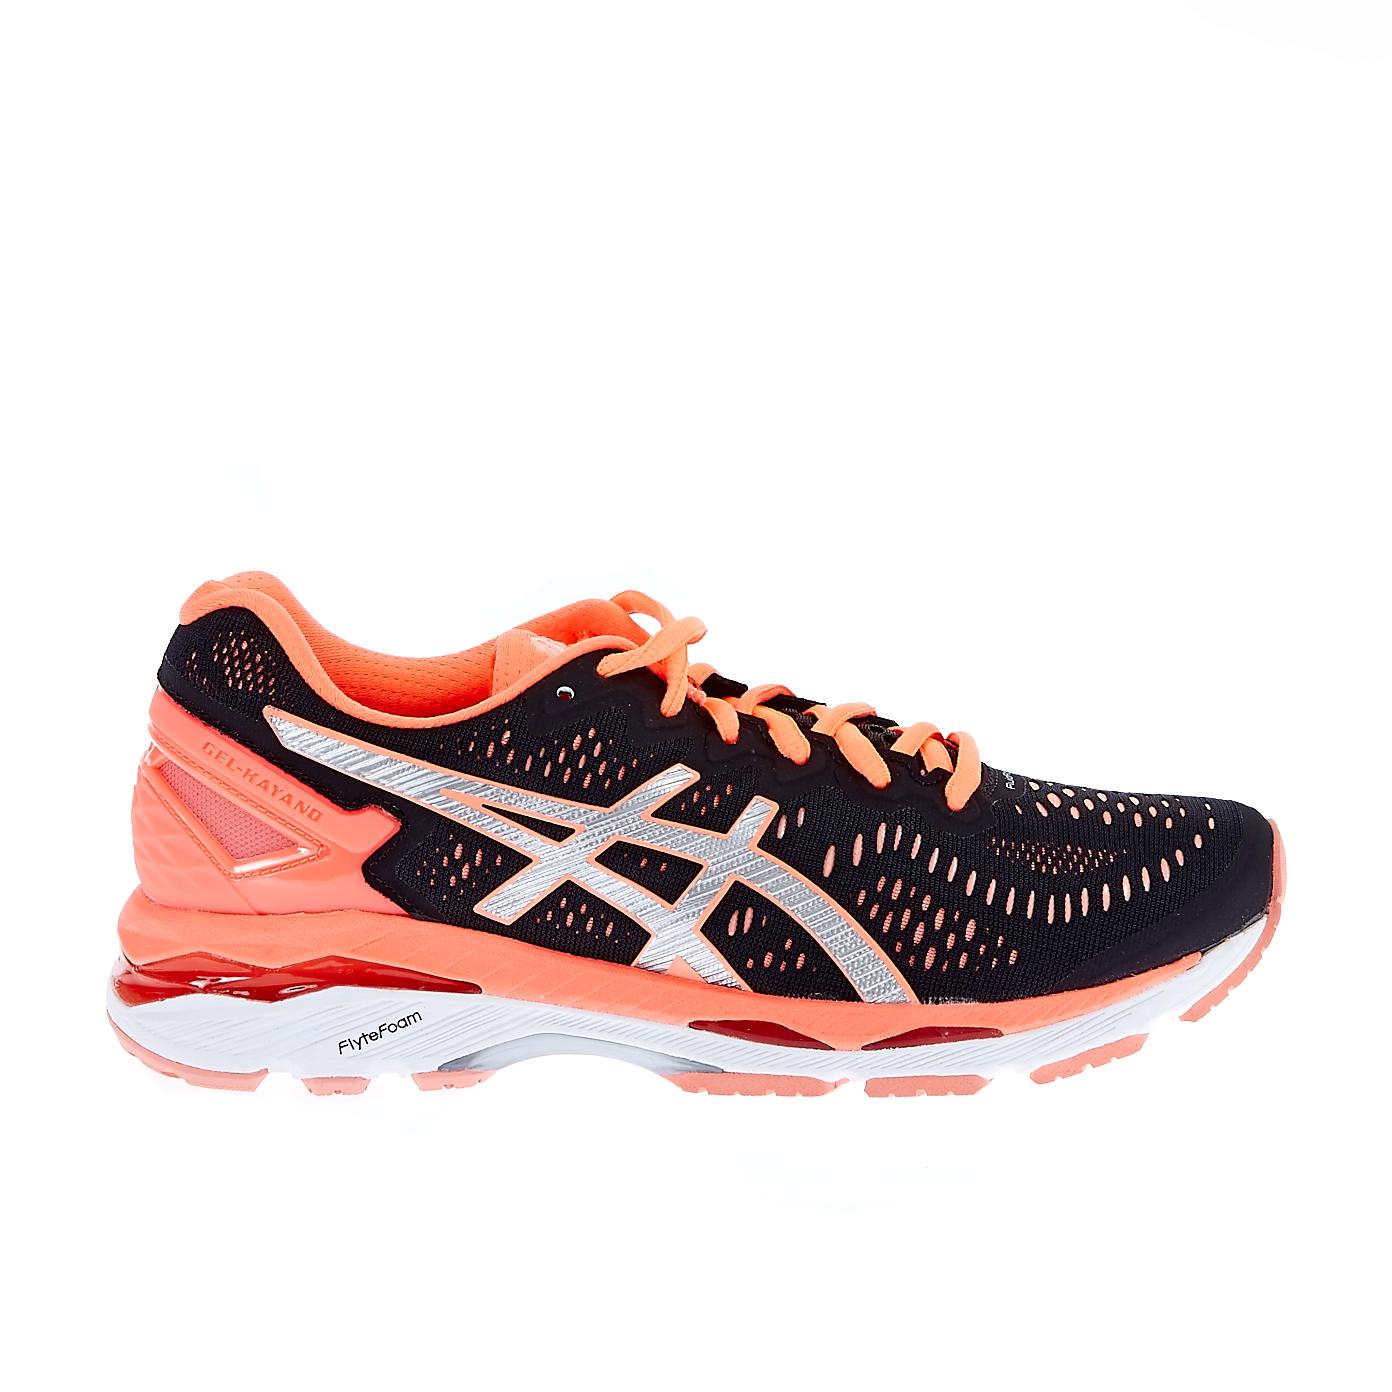 ASICS - Γυναικεία παπούτσια Asics GEL-KAYANO 23 μαύρο-κοραλί